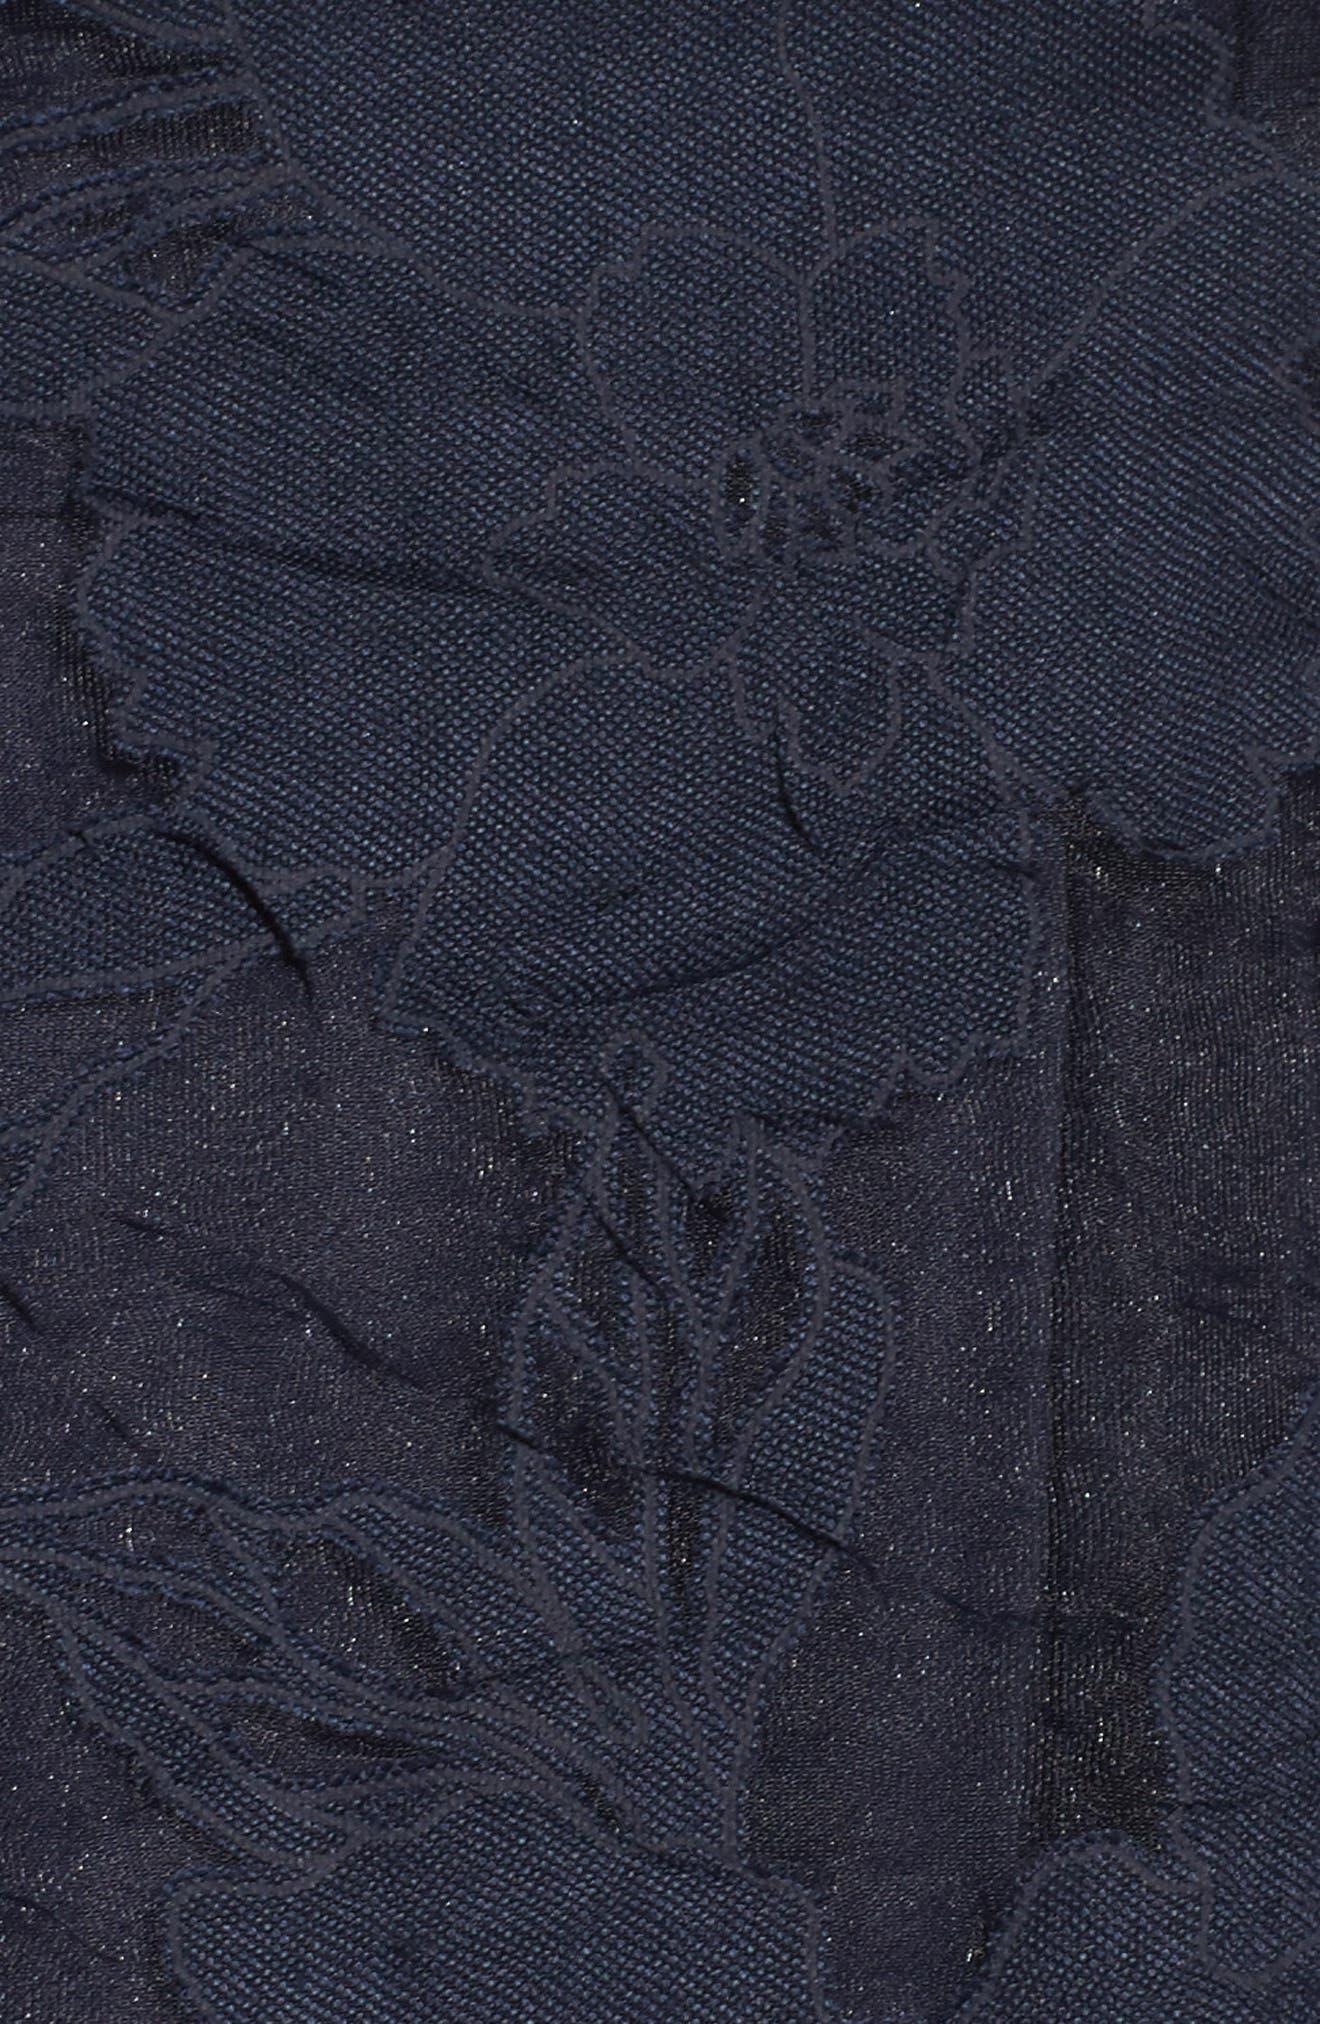 Lace Fit & Flare Dress,                             Alternate thumbnail 6, color,                             Navy/ Black